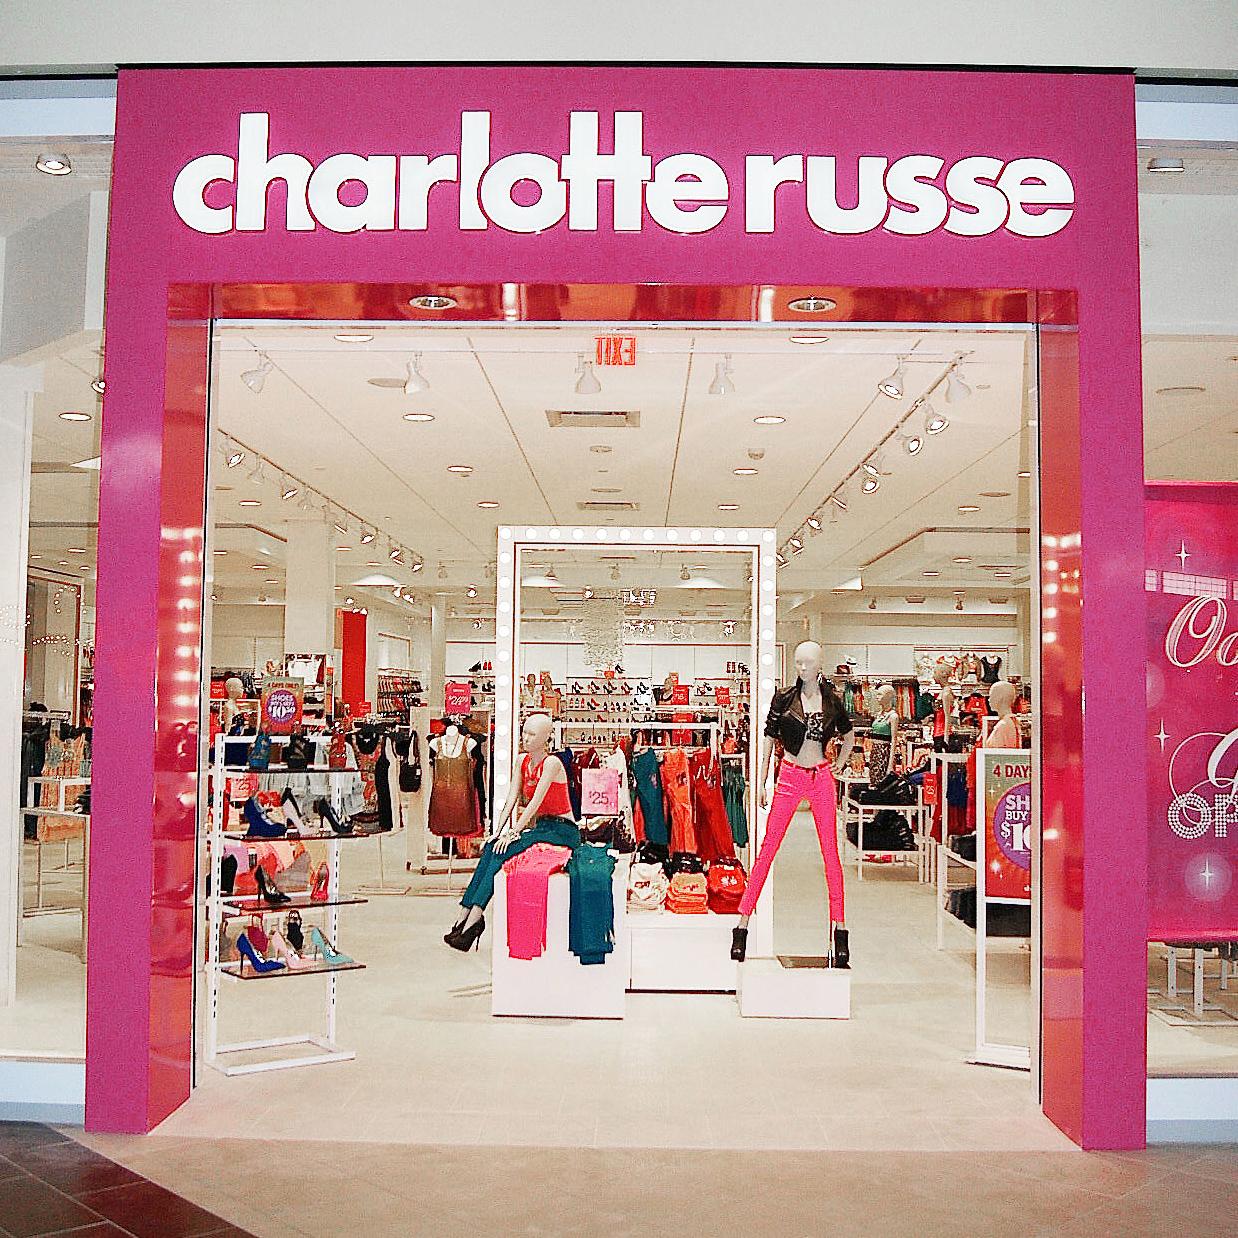 Bdc credit reporter bdc exposure to apparel retailer charlotte bdc credit reporter bdc exposure to apparel retailer charlotte russe bdc reporter falaconquin